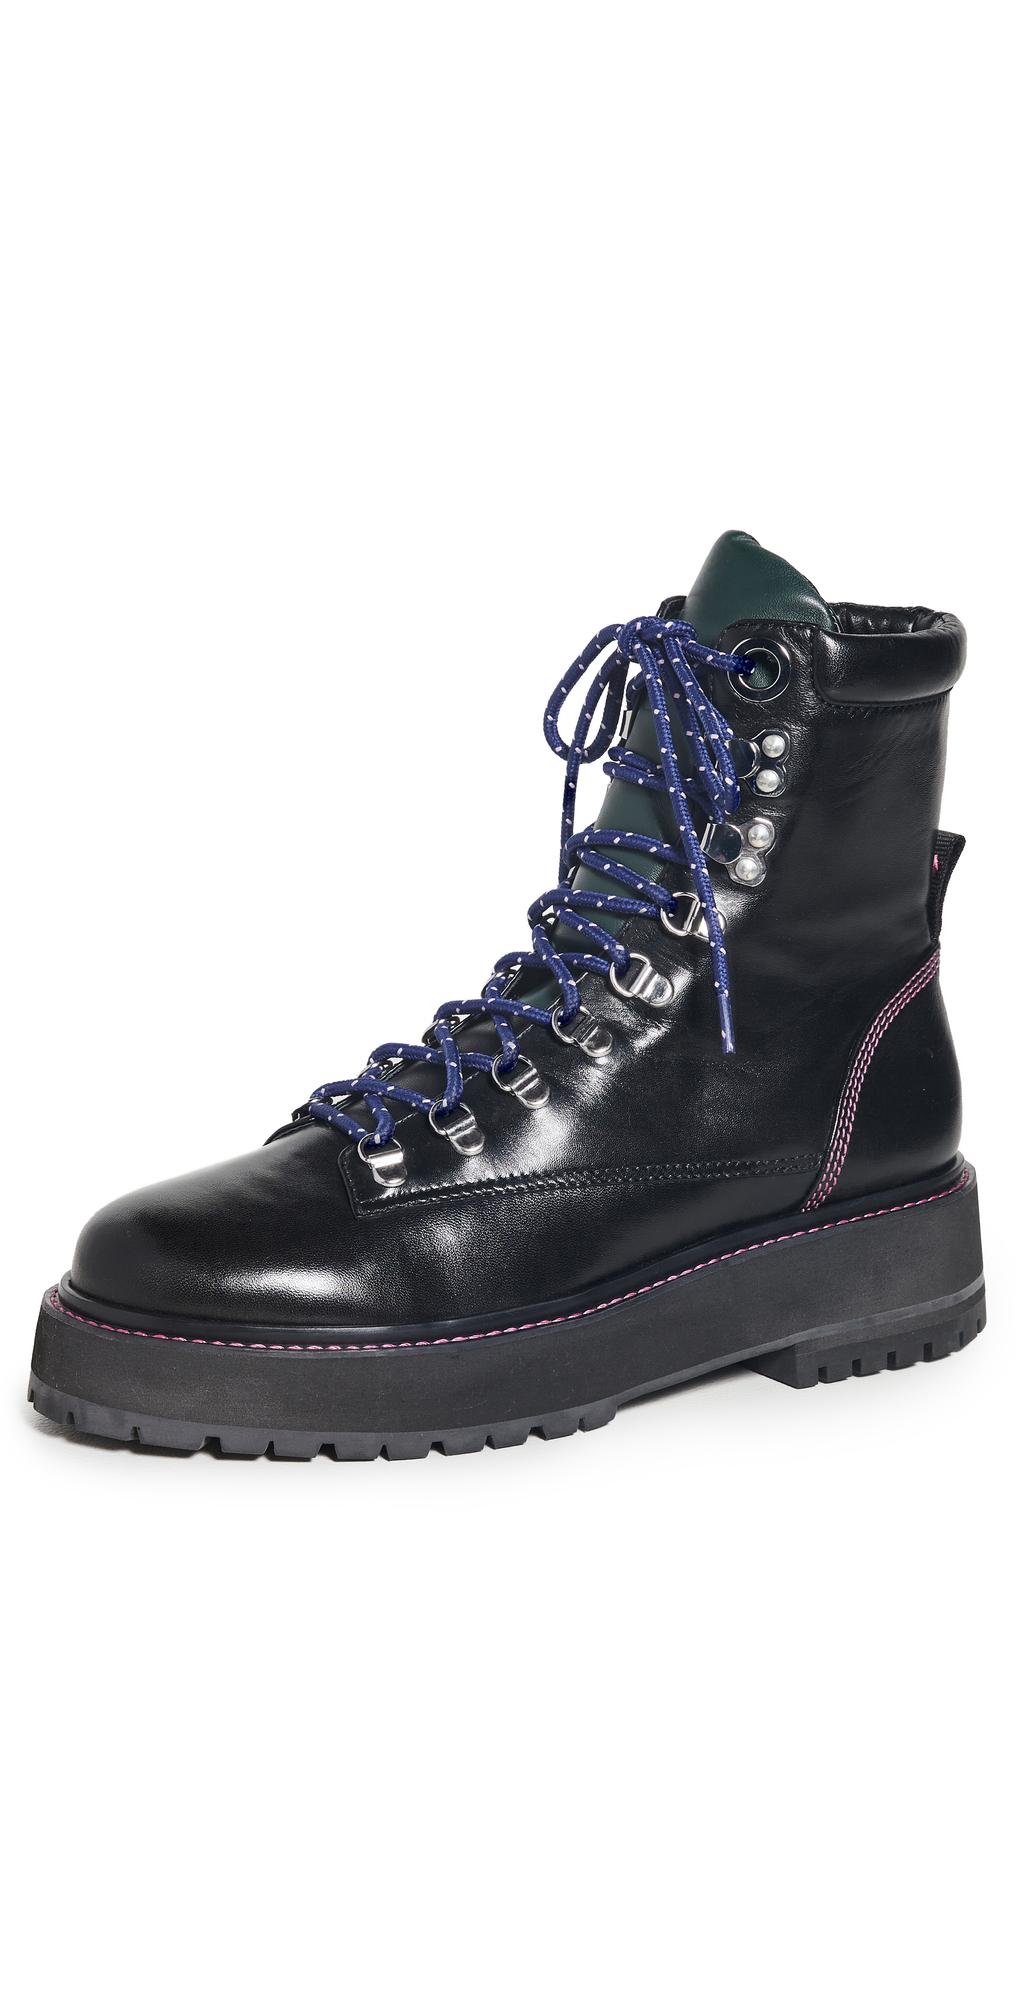 Jordan Low Boots